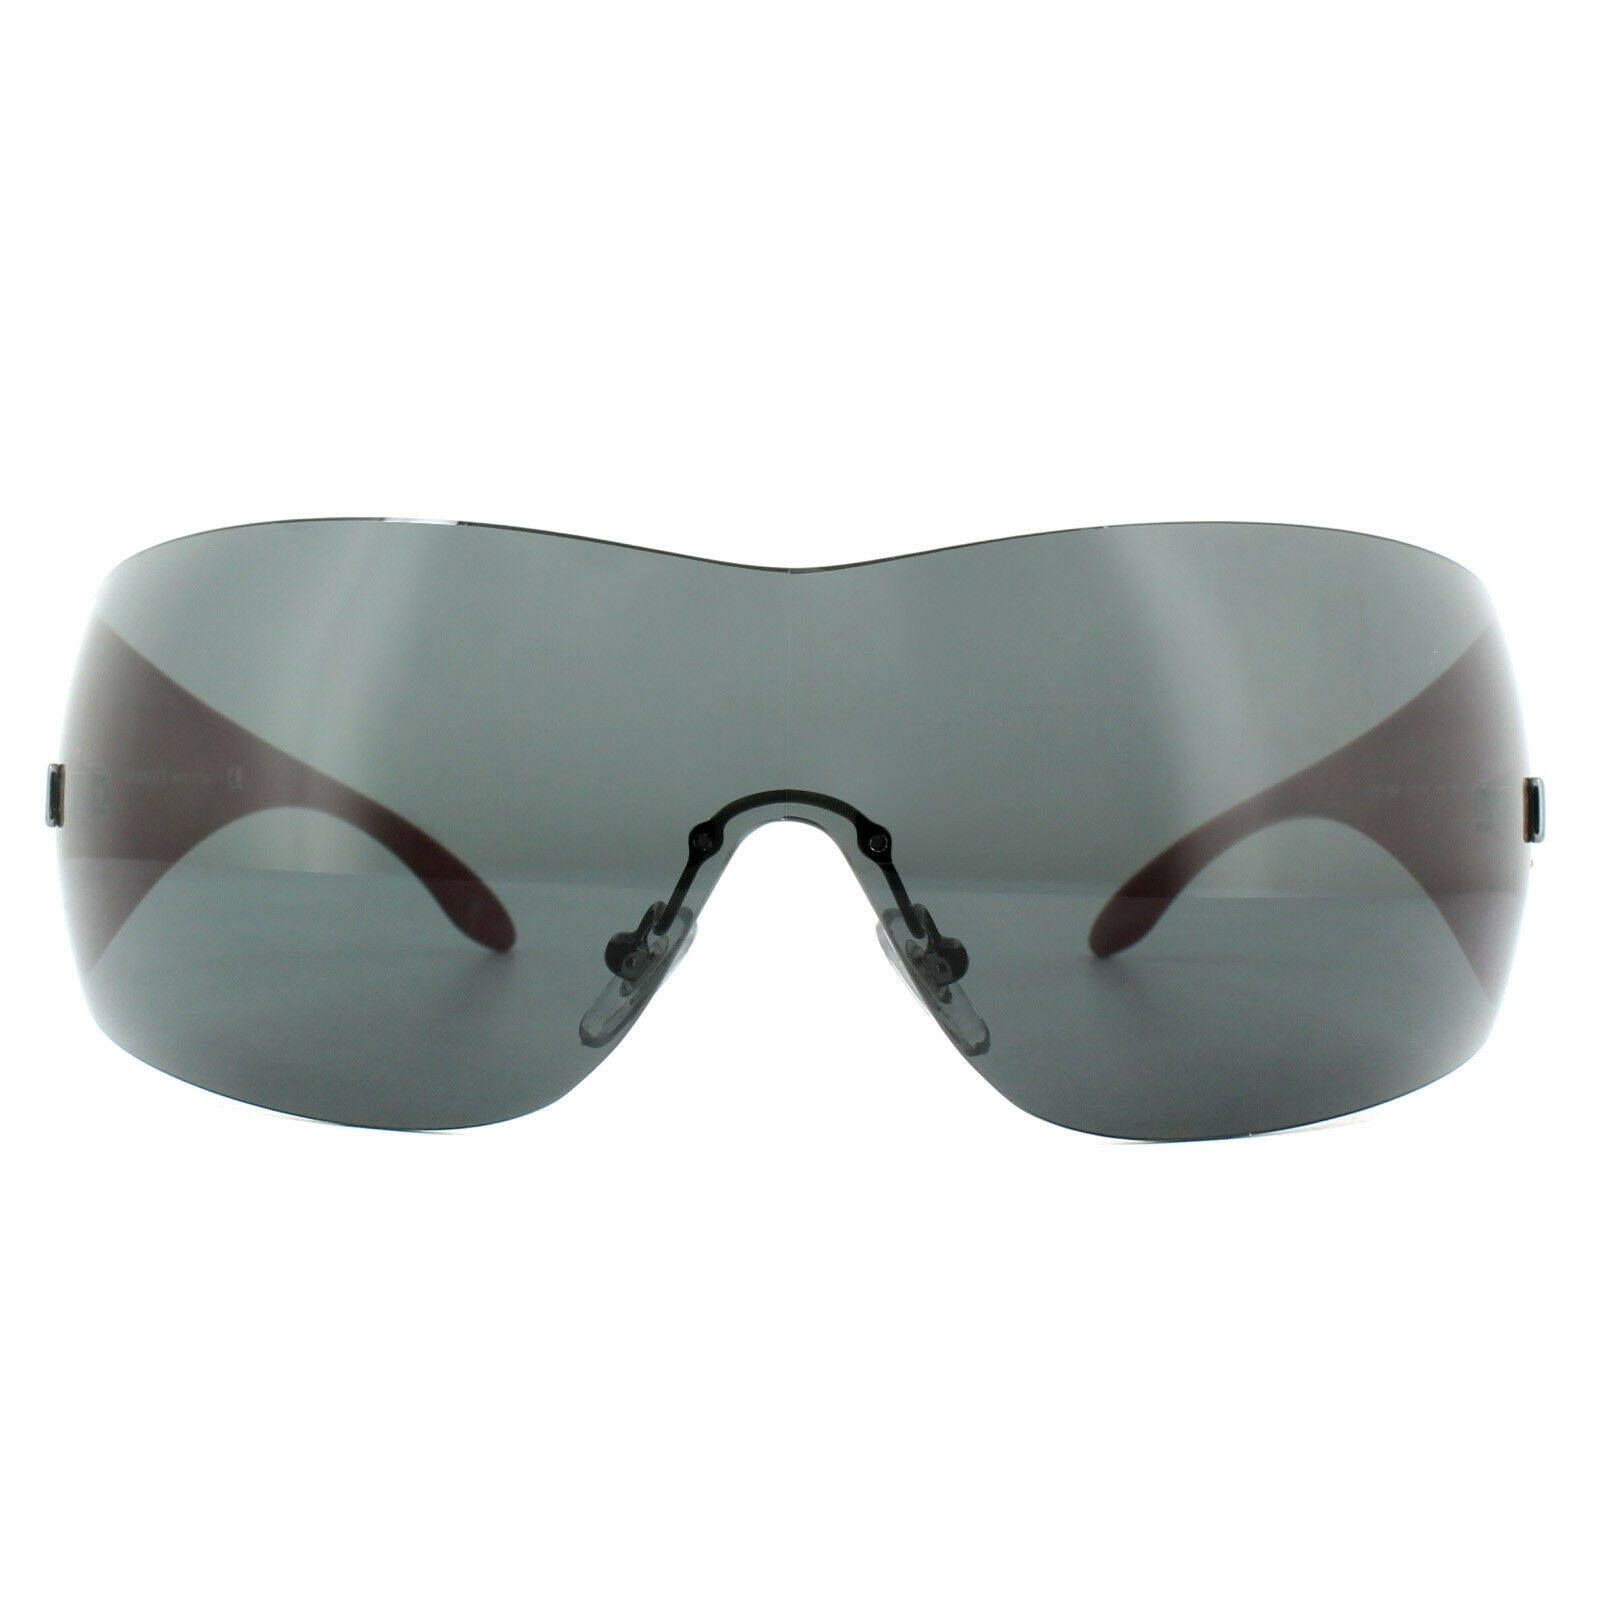 ae8d5e6ca13 Authentic Versace Ve 2054 Sunglasses 1001 87 Black Red Grey Ve2054 ...